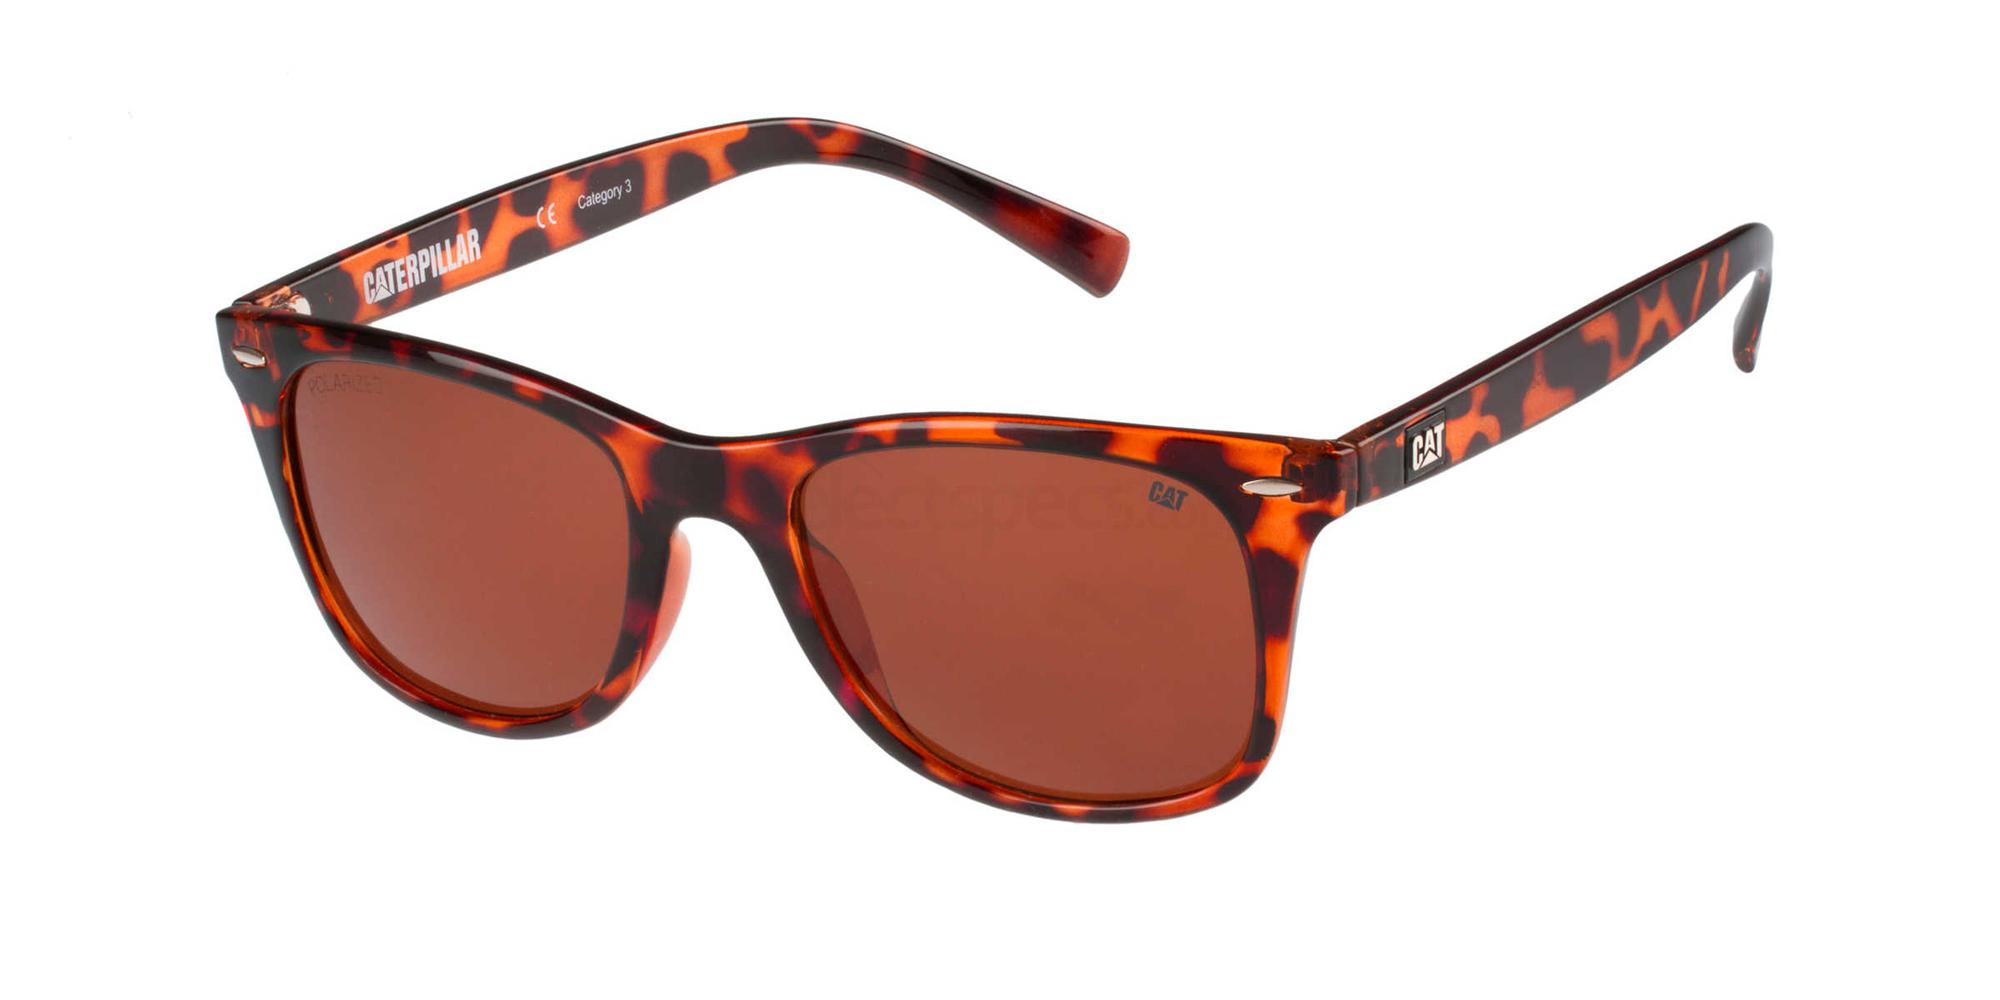 102P CTS-16002-P Sunglasses, CAT